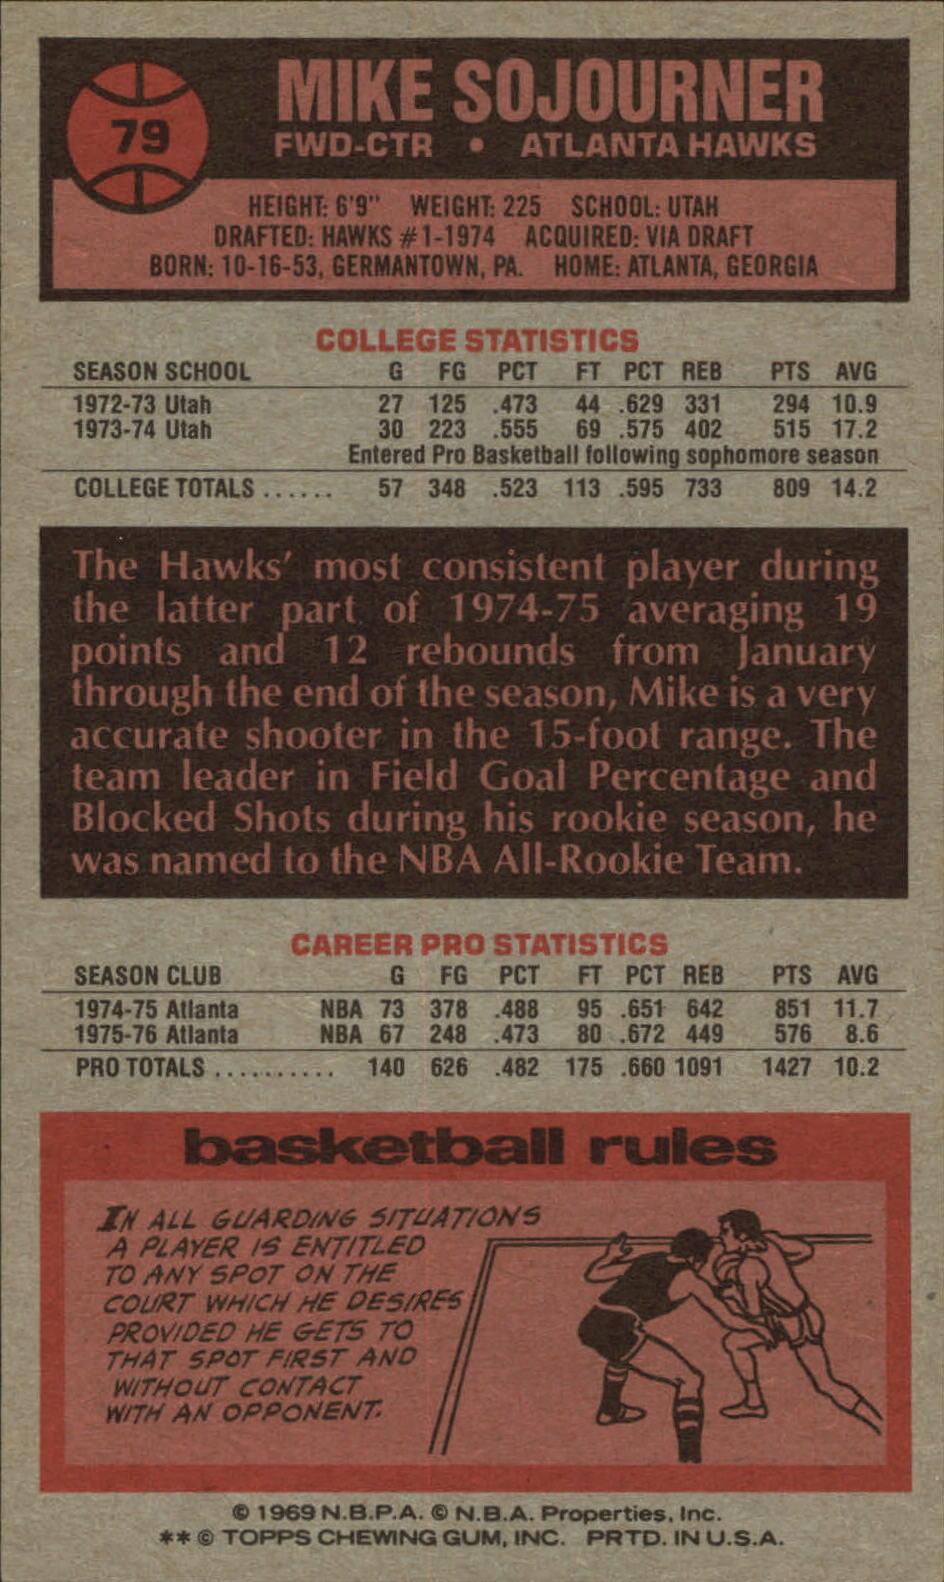 1976-77 Topps #79 Mike Sojourner back image